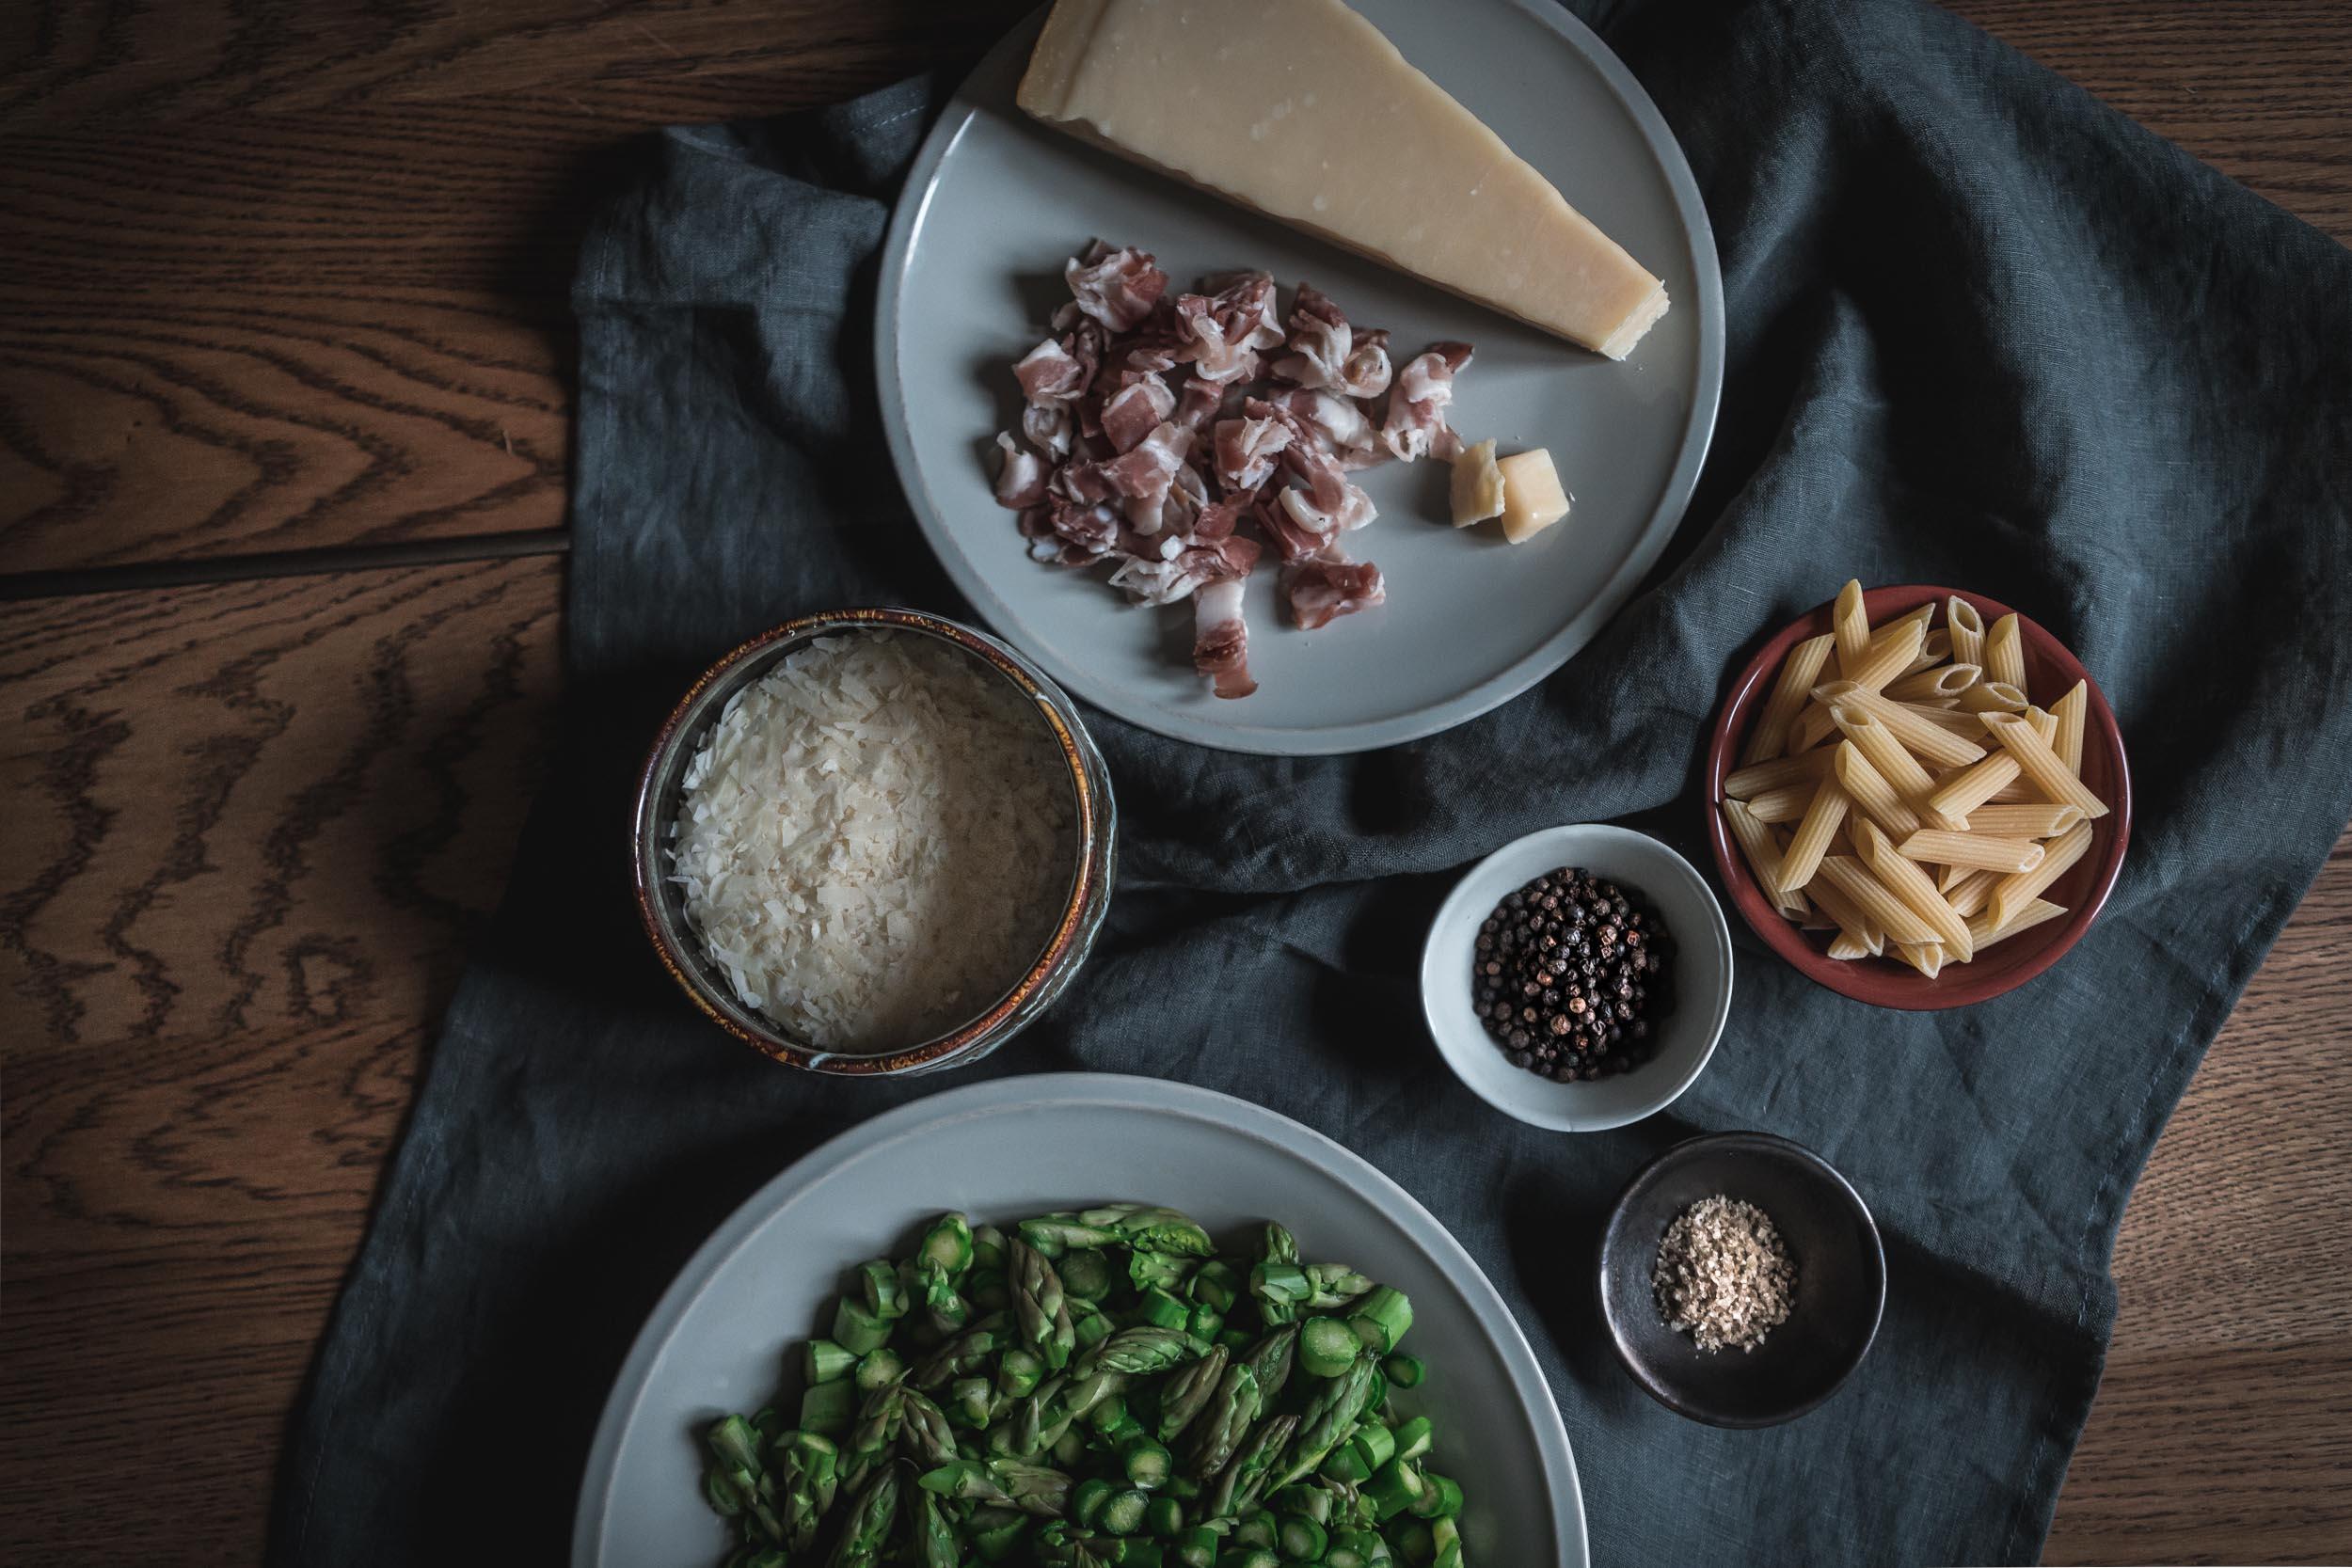 Asparagus-and-Bacon-Penne-Pasta-05099.jpg